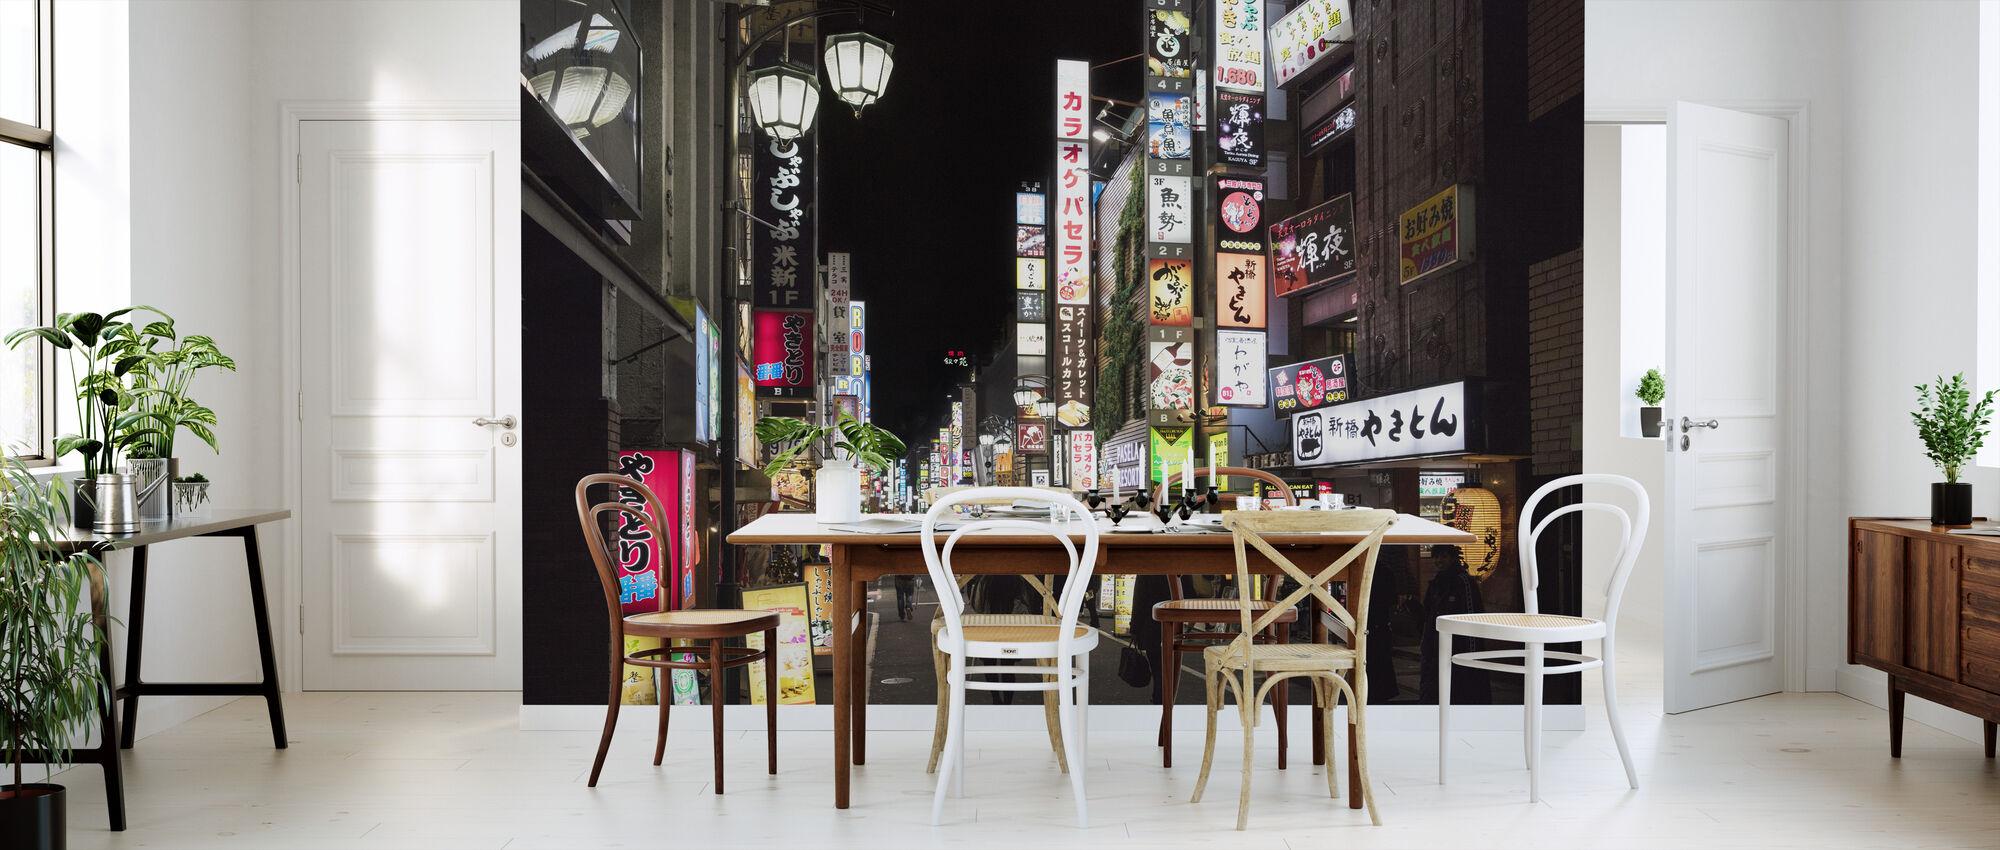 Shibuja på natten Tokyo - Tapet - Kök